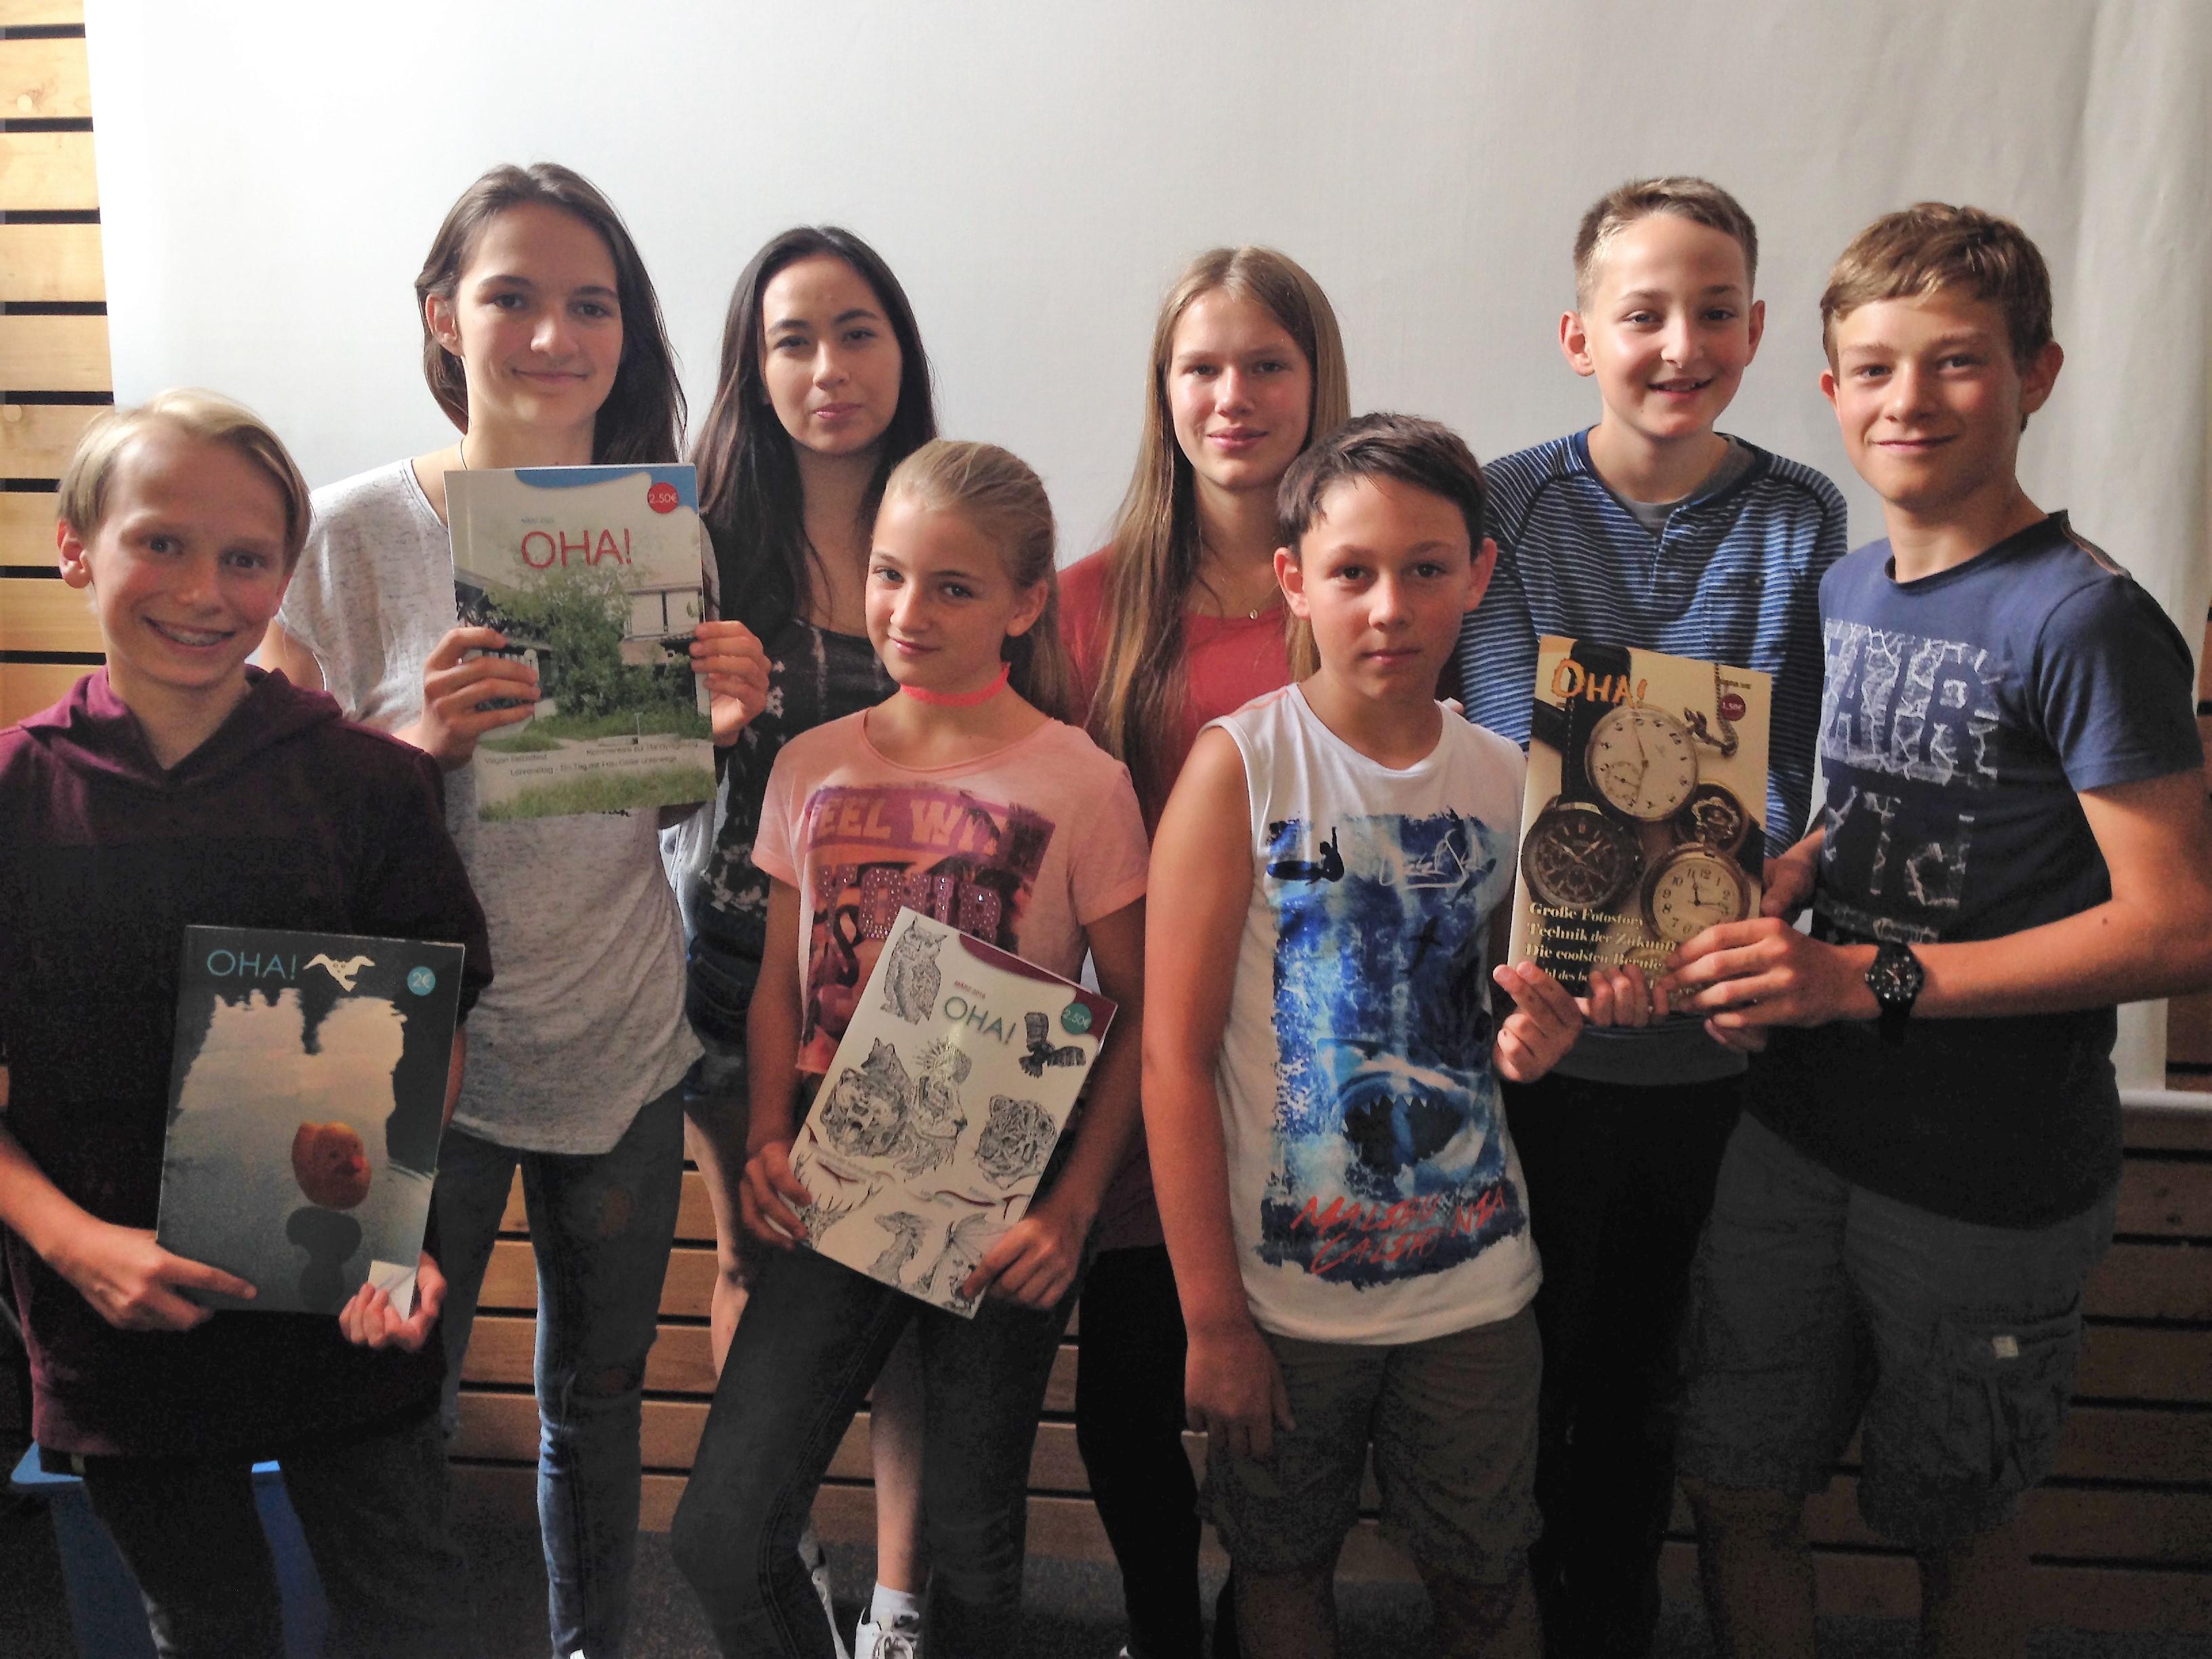 Gruppenbild des Schülerzeitungsteam